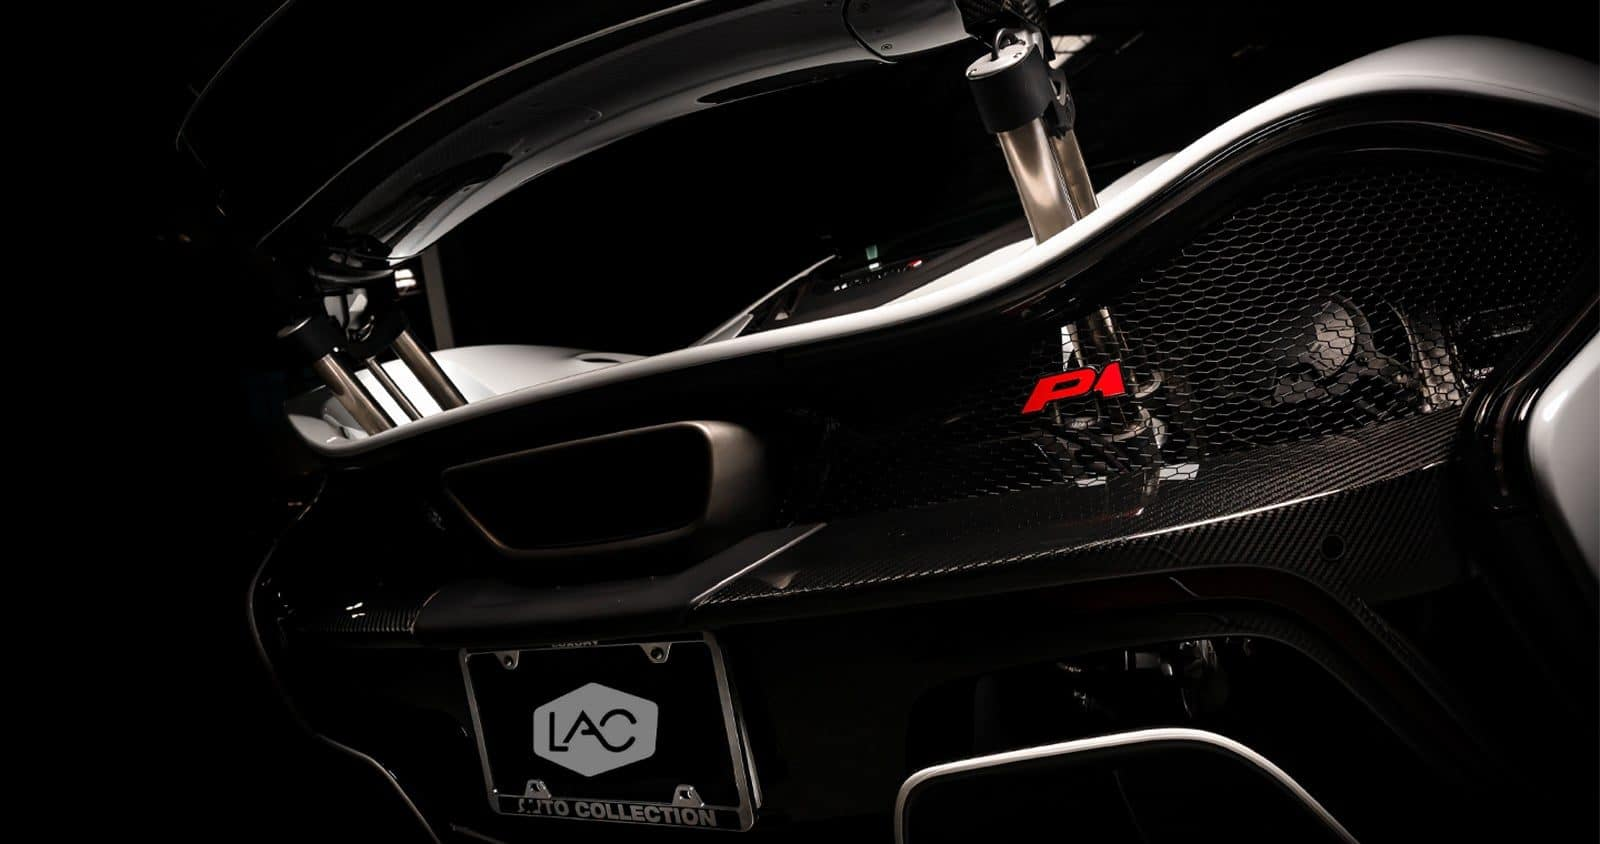 Luxury Auto Collection 1